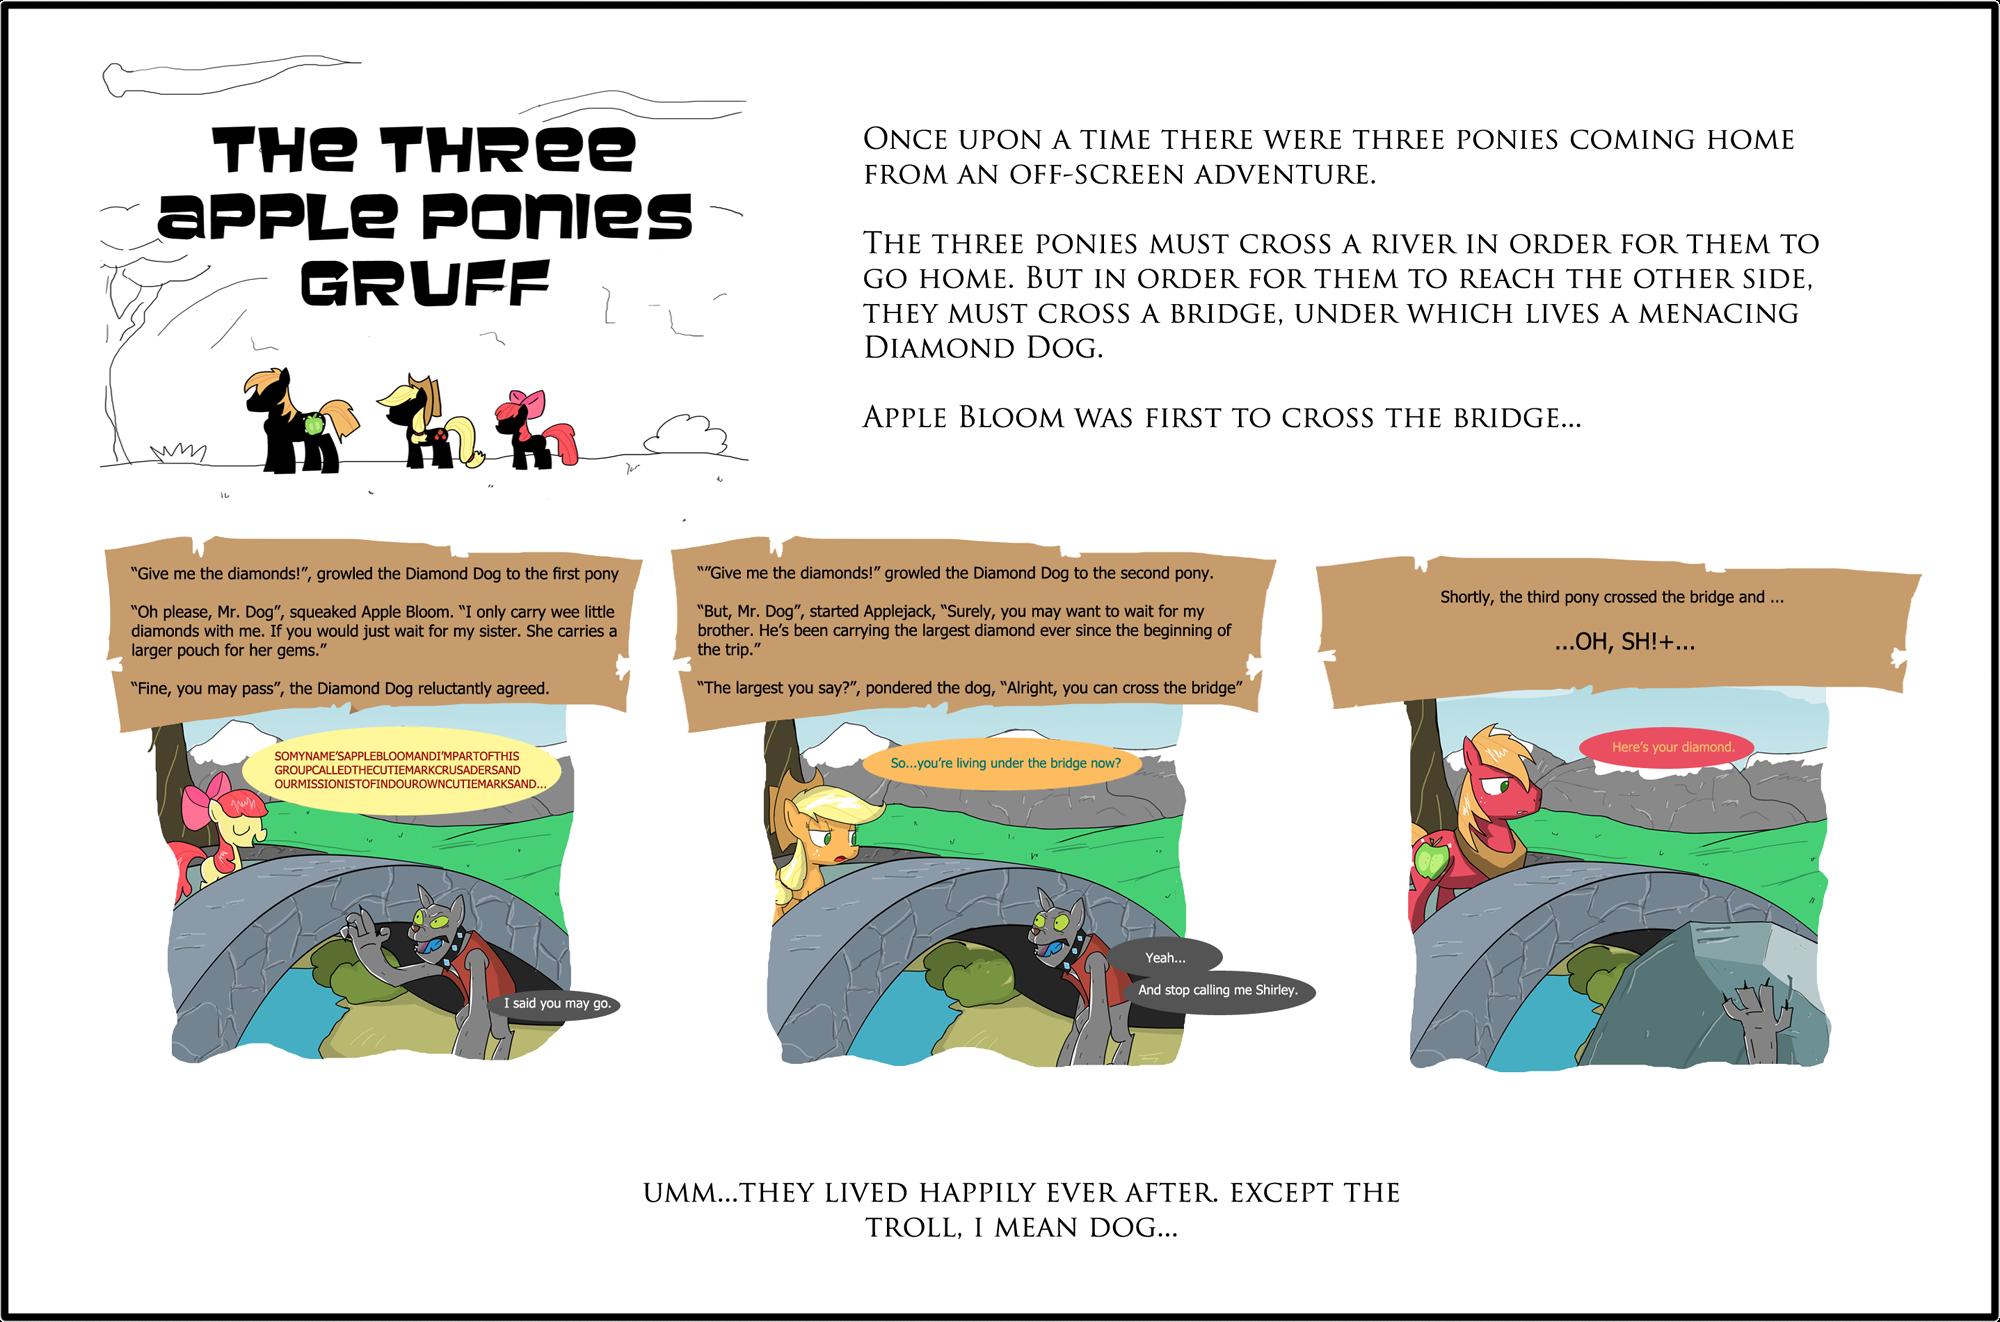 The Three Apple Ponies Gruff by TheWormOuroboros